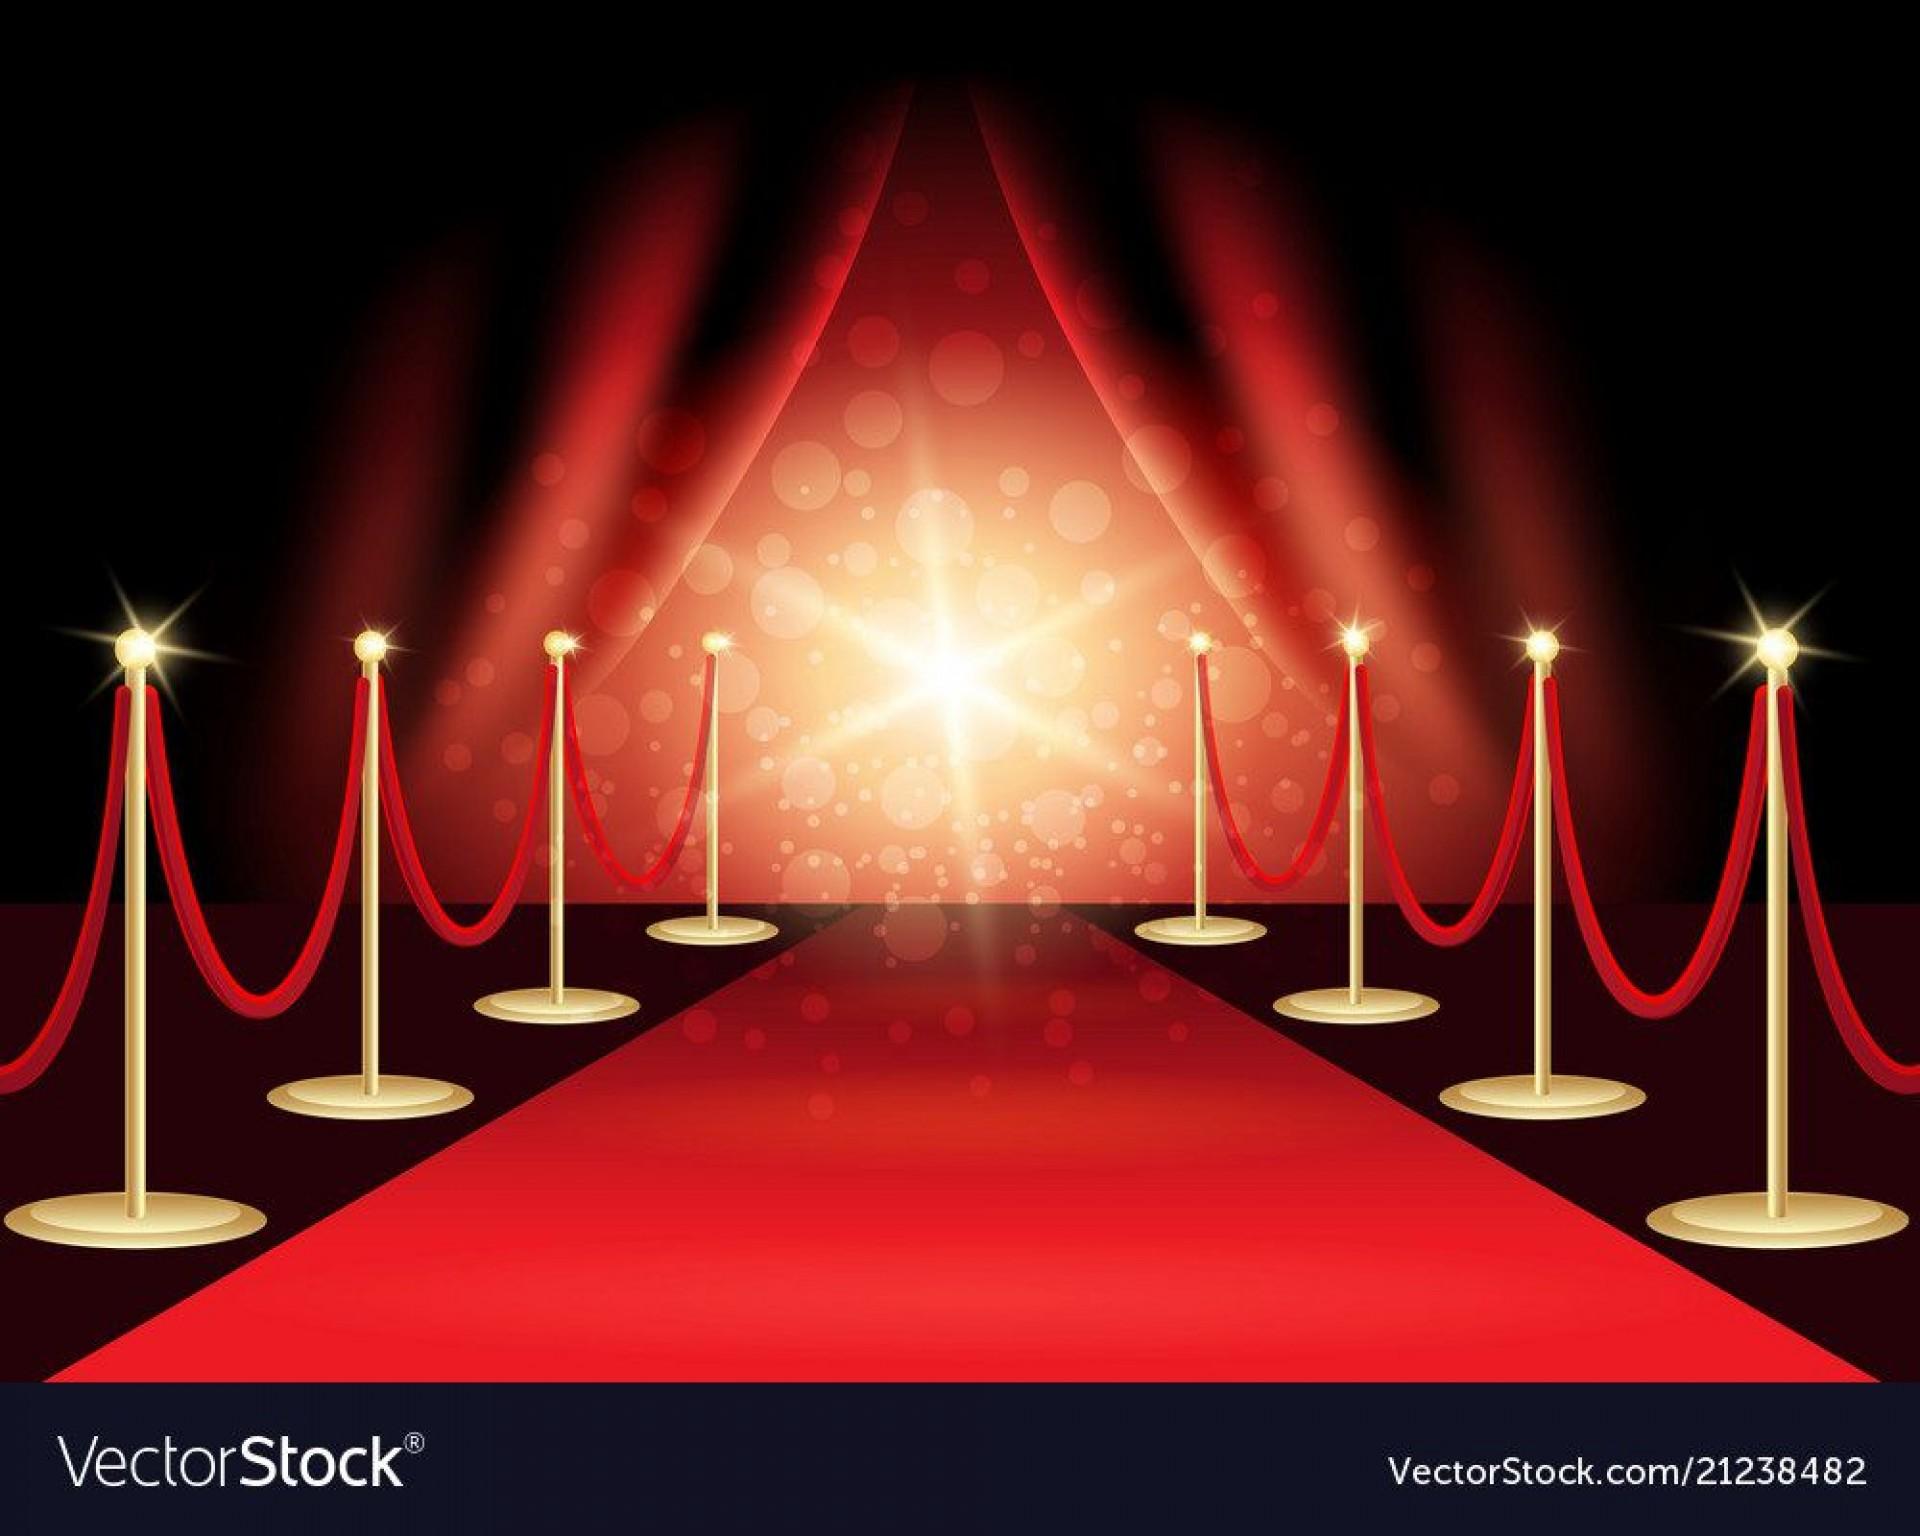 009 Singular Red Carpet Invitation Template Free Highest Quality  Download1920